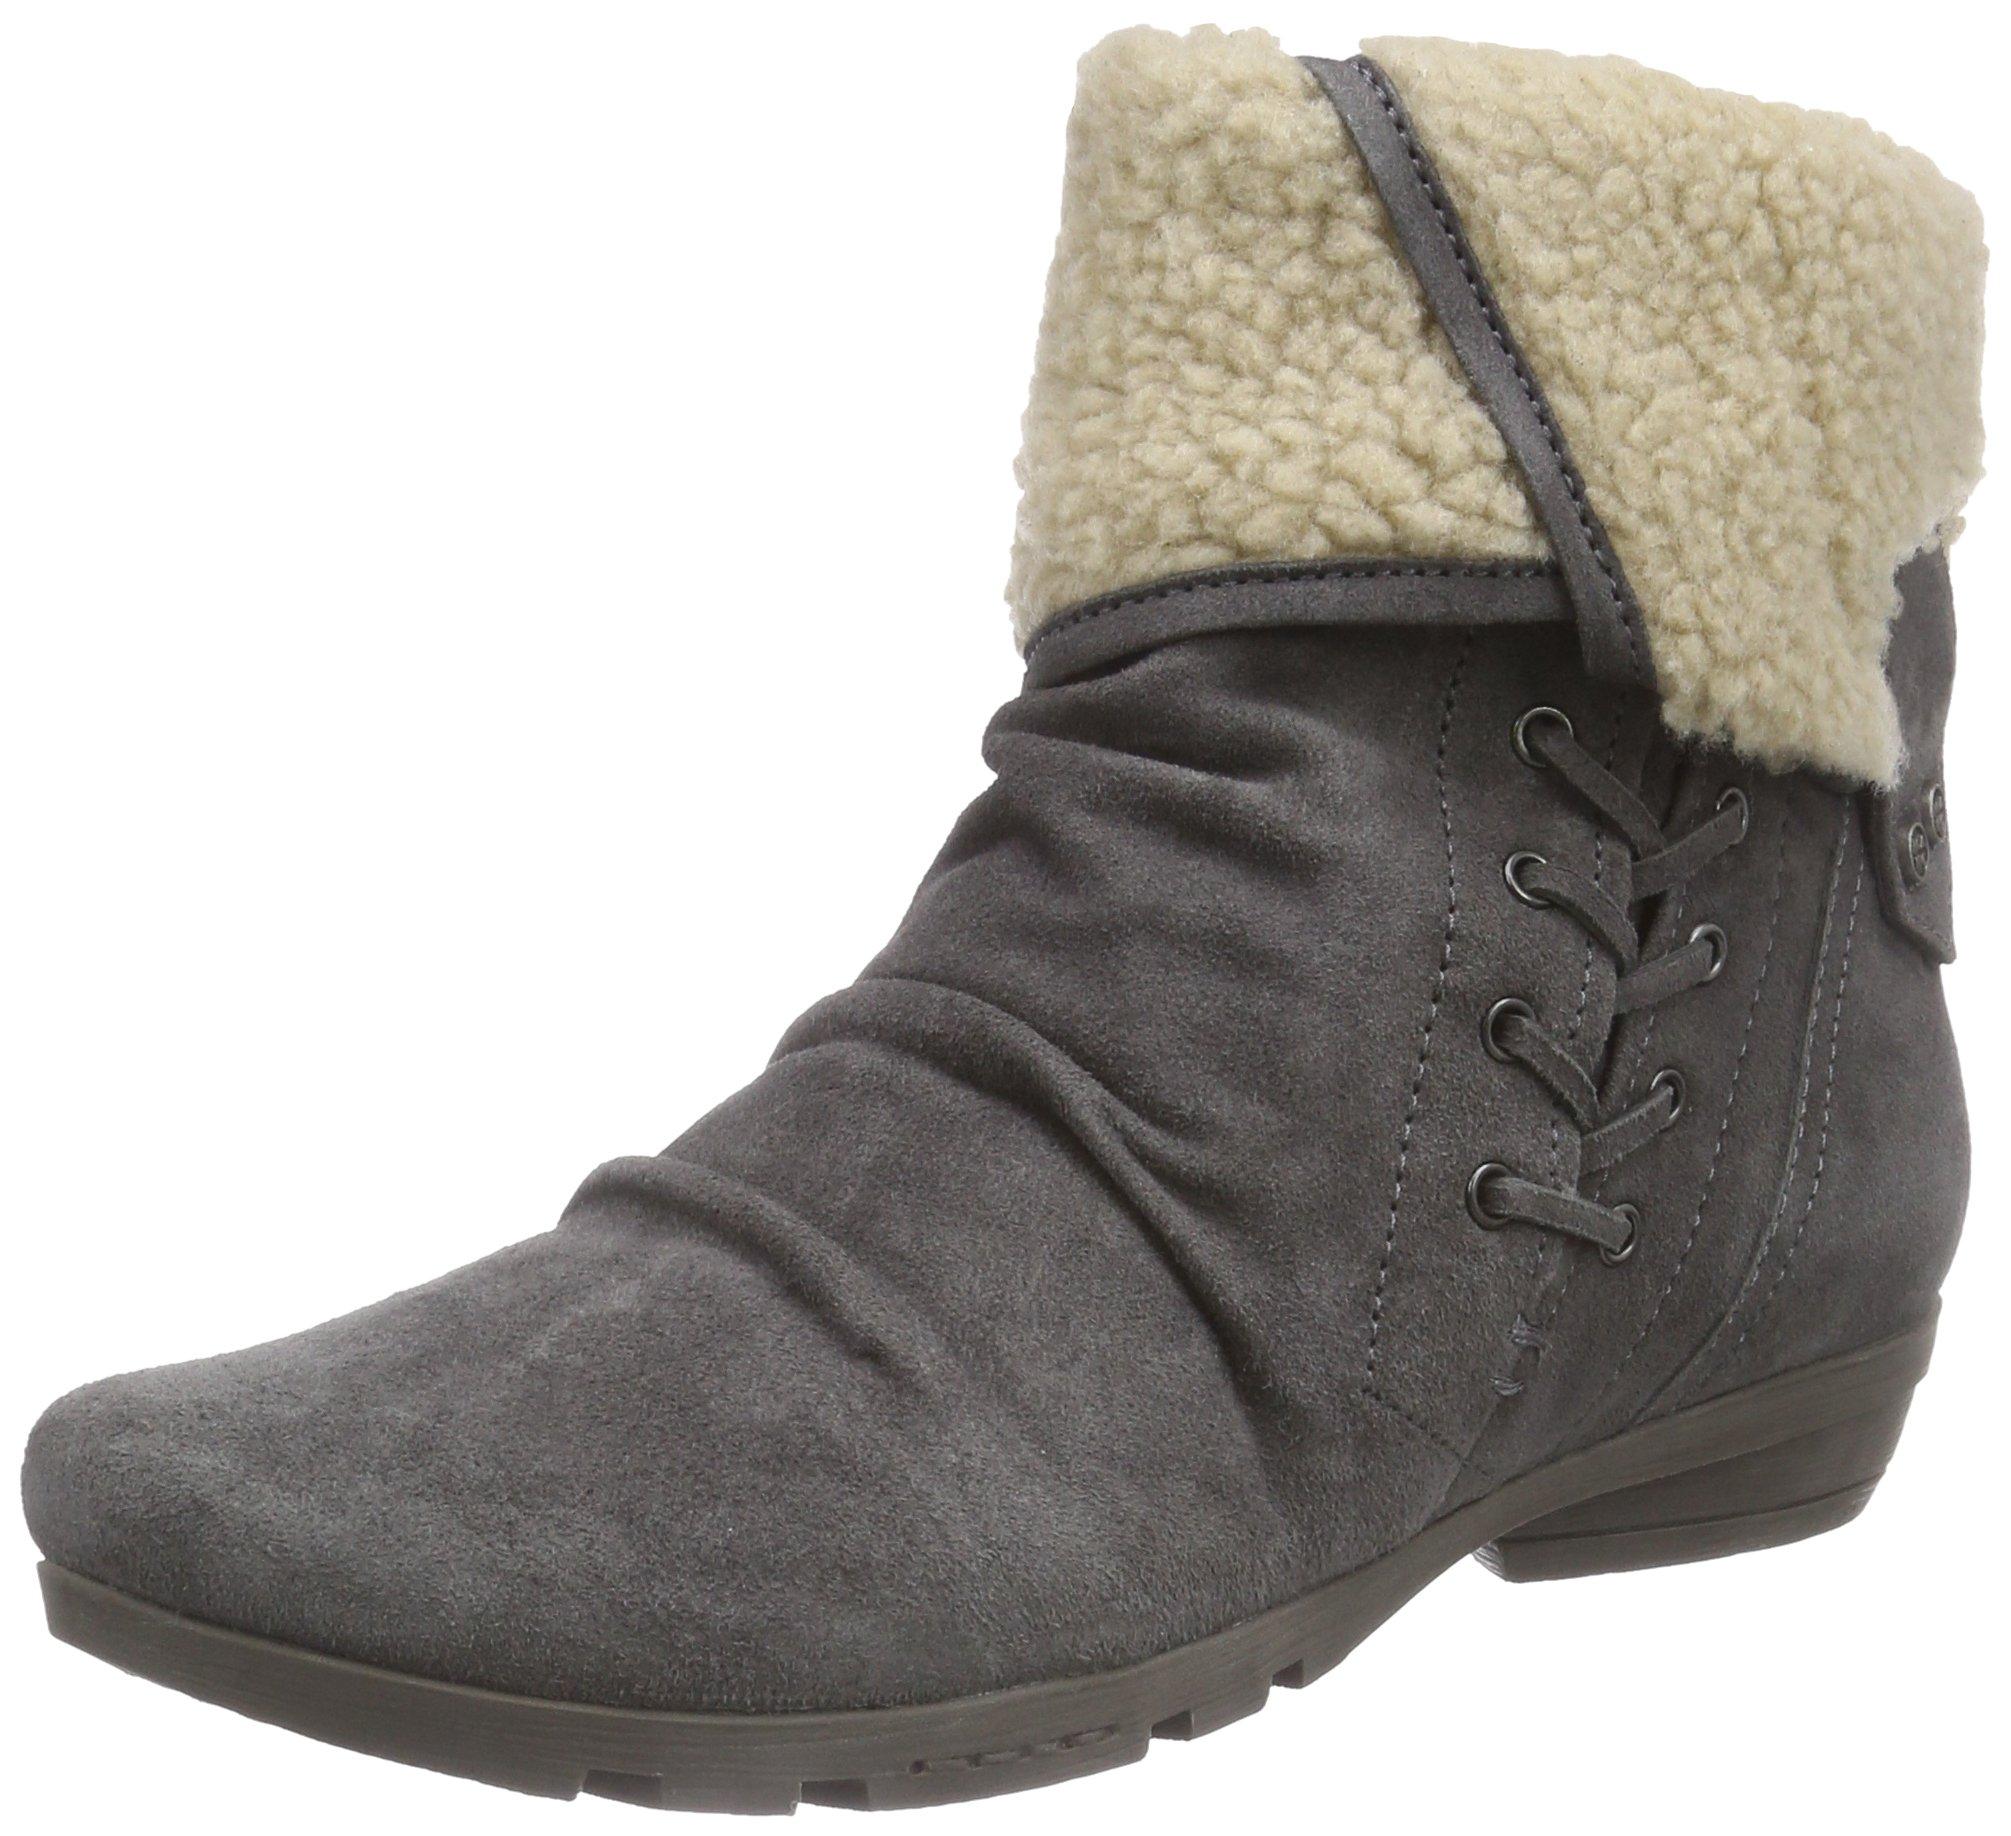 Marc IiBottes Chaude Grauasphalt CourtesDoublure Classics Shoes Eu Zarah FemmesGris 12036 34ARq5jL